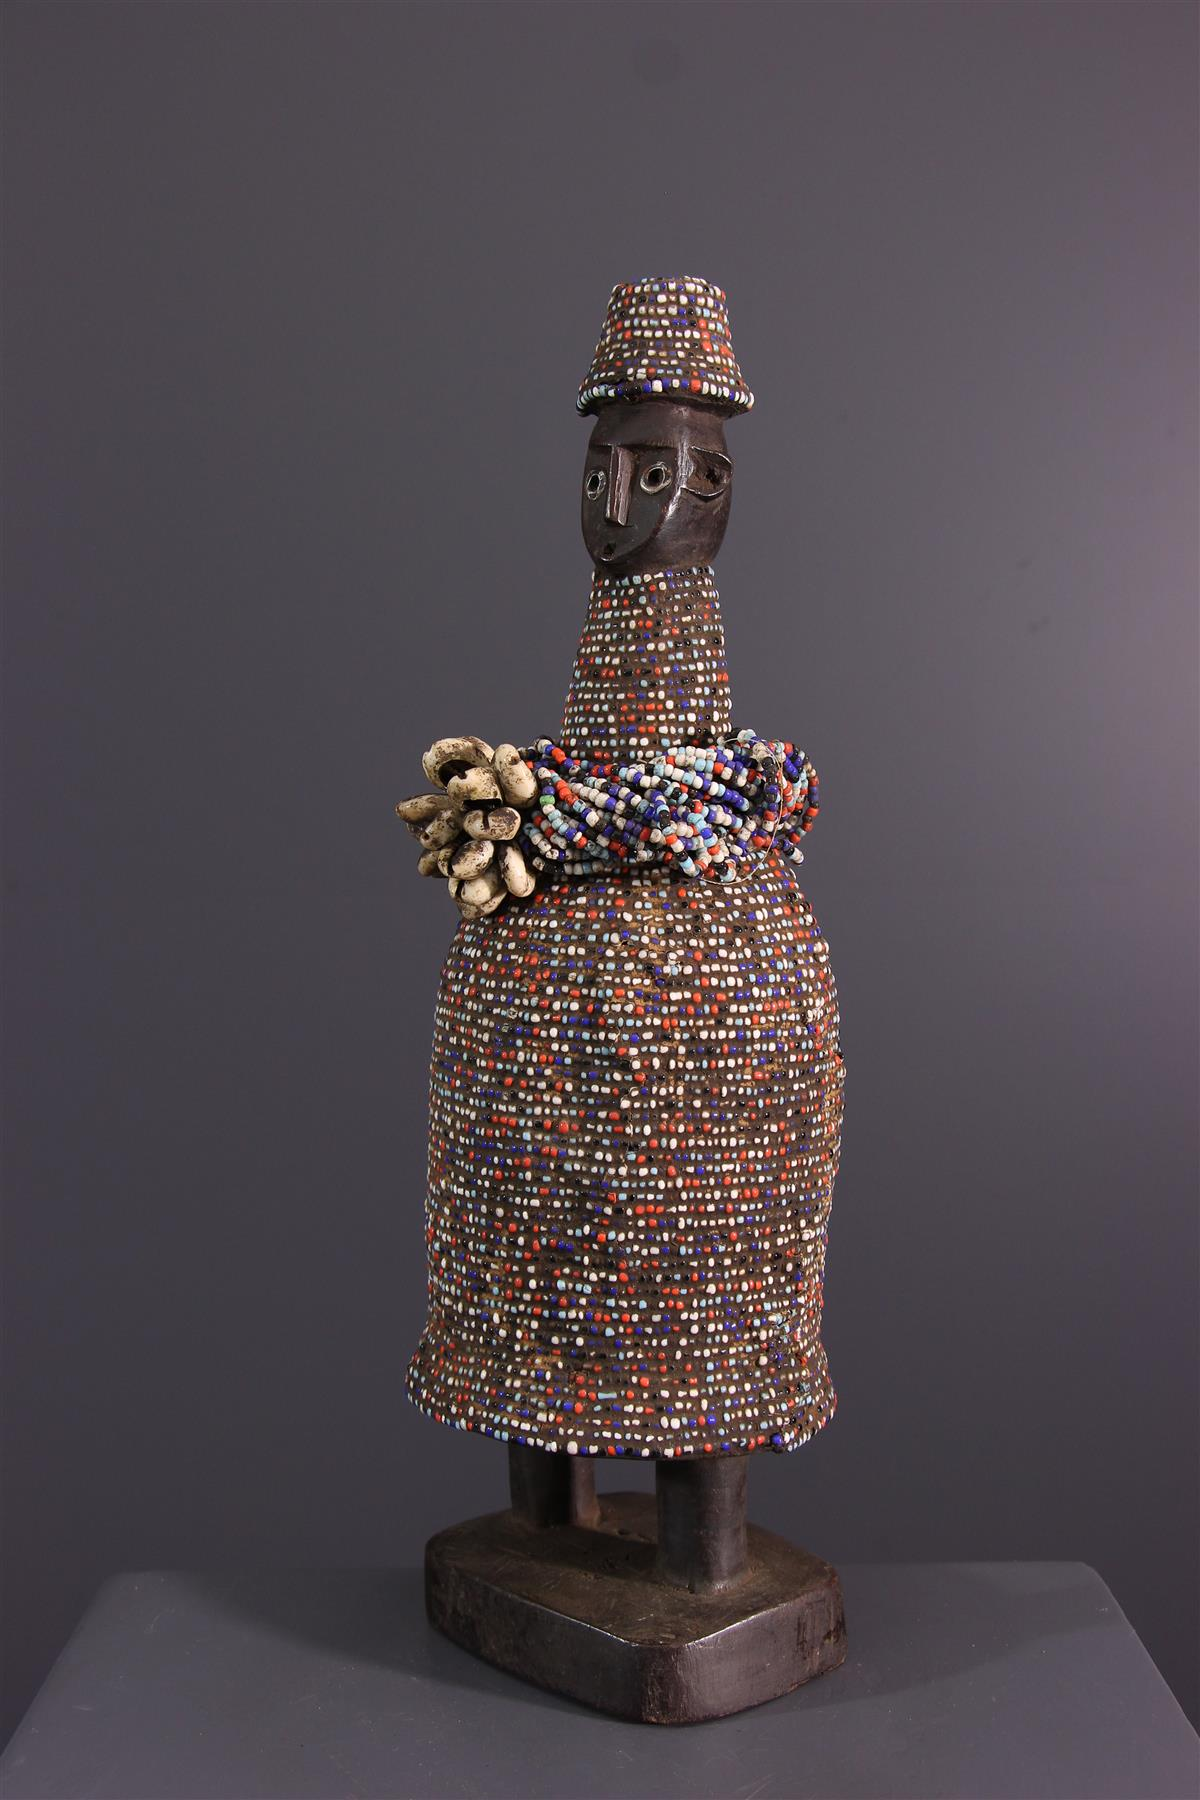 Kikuyu doll - African art